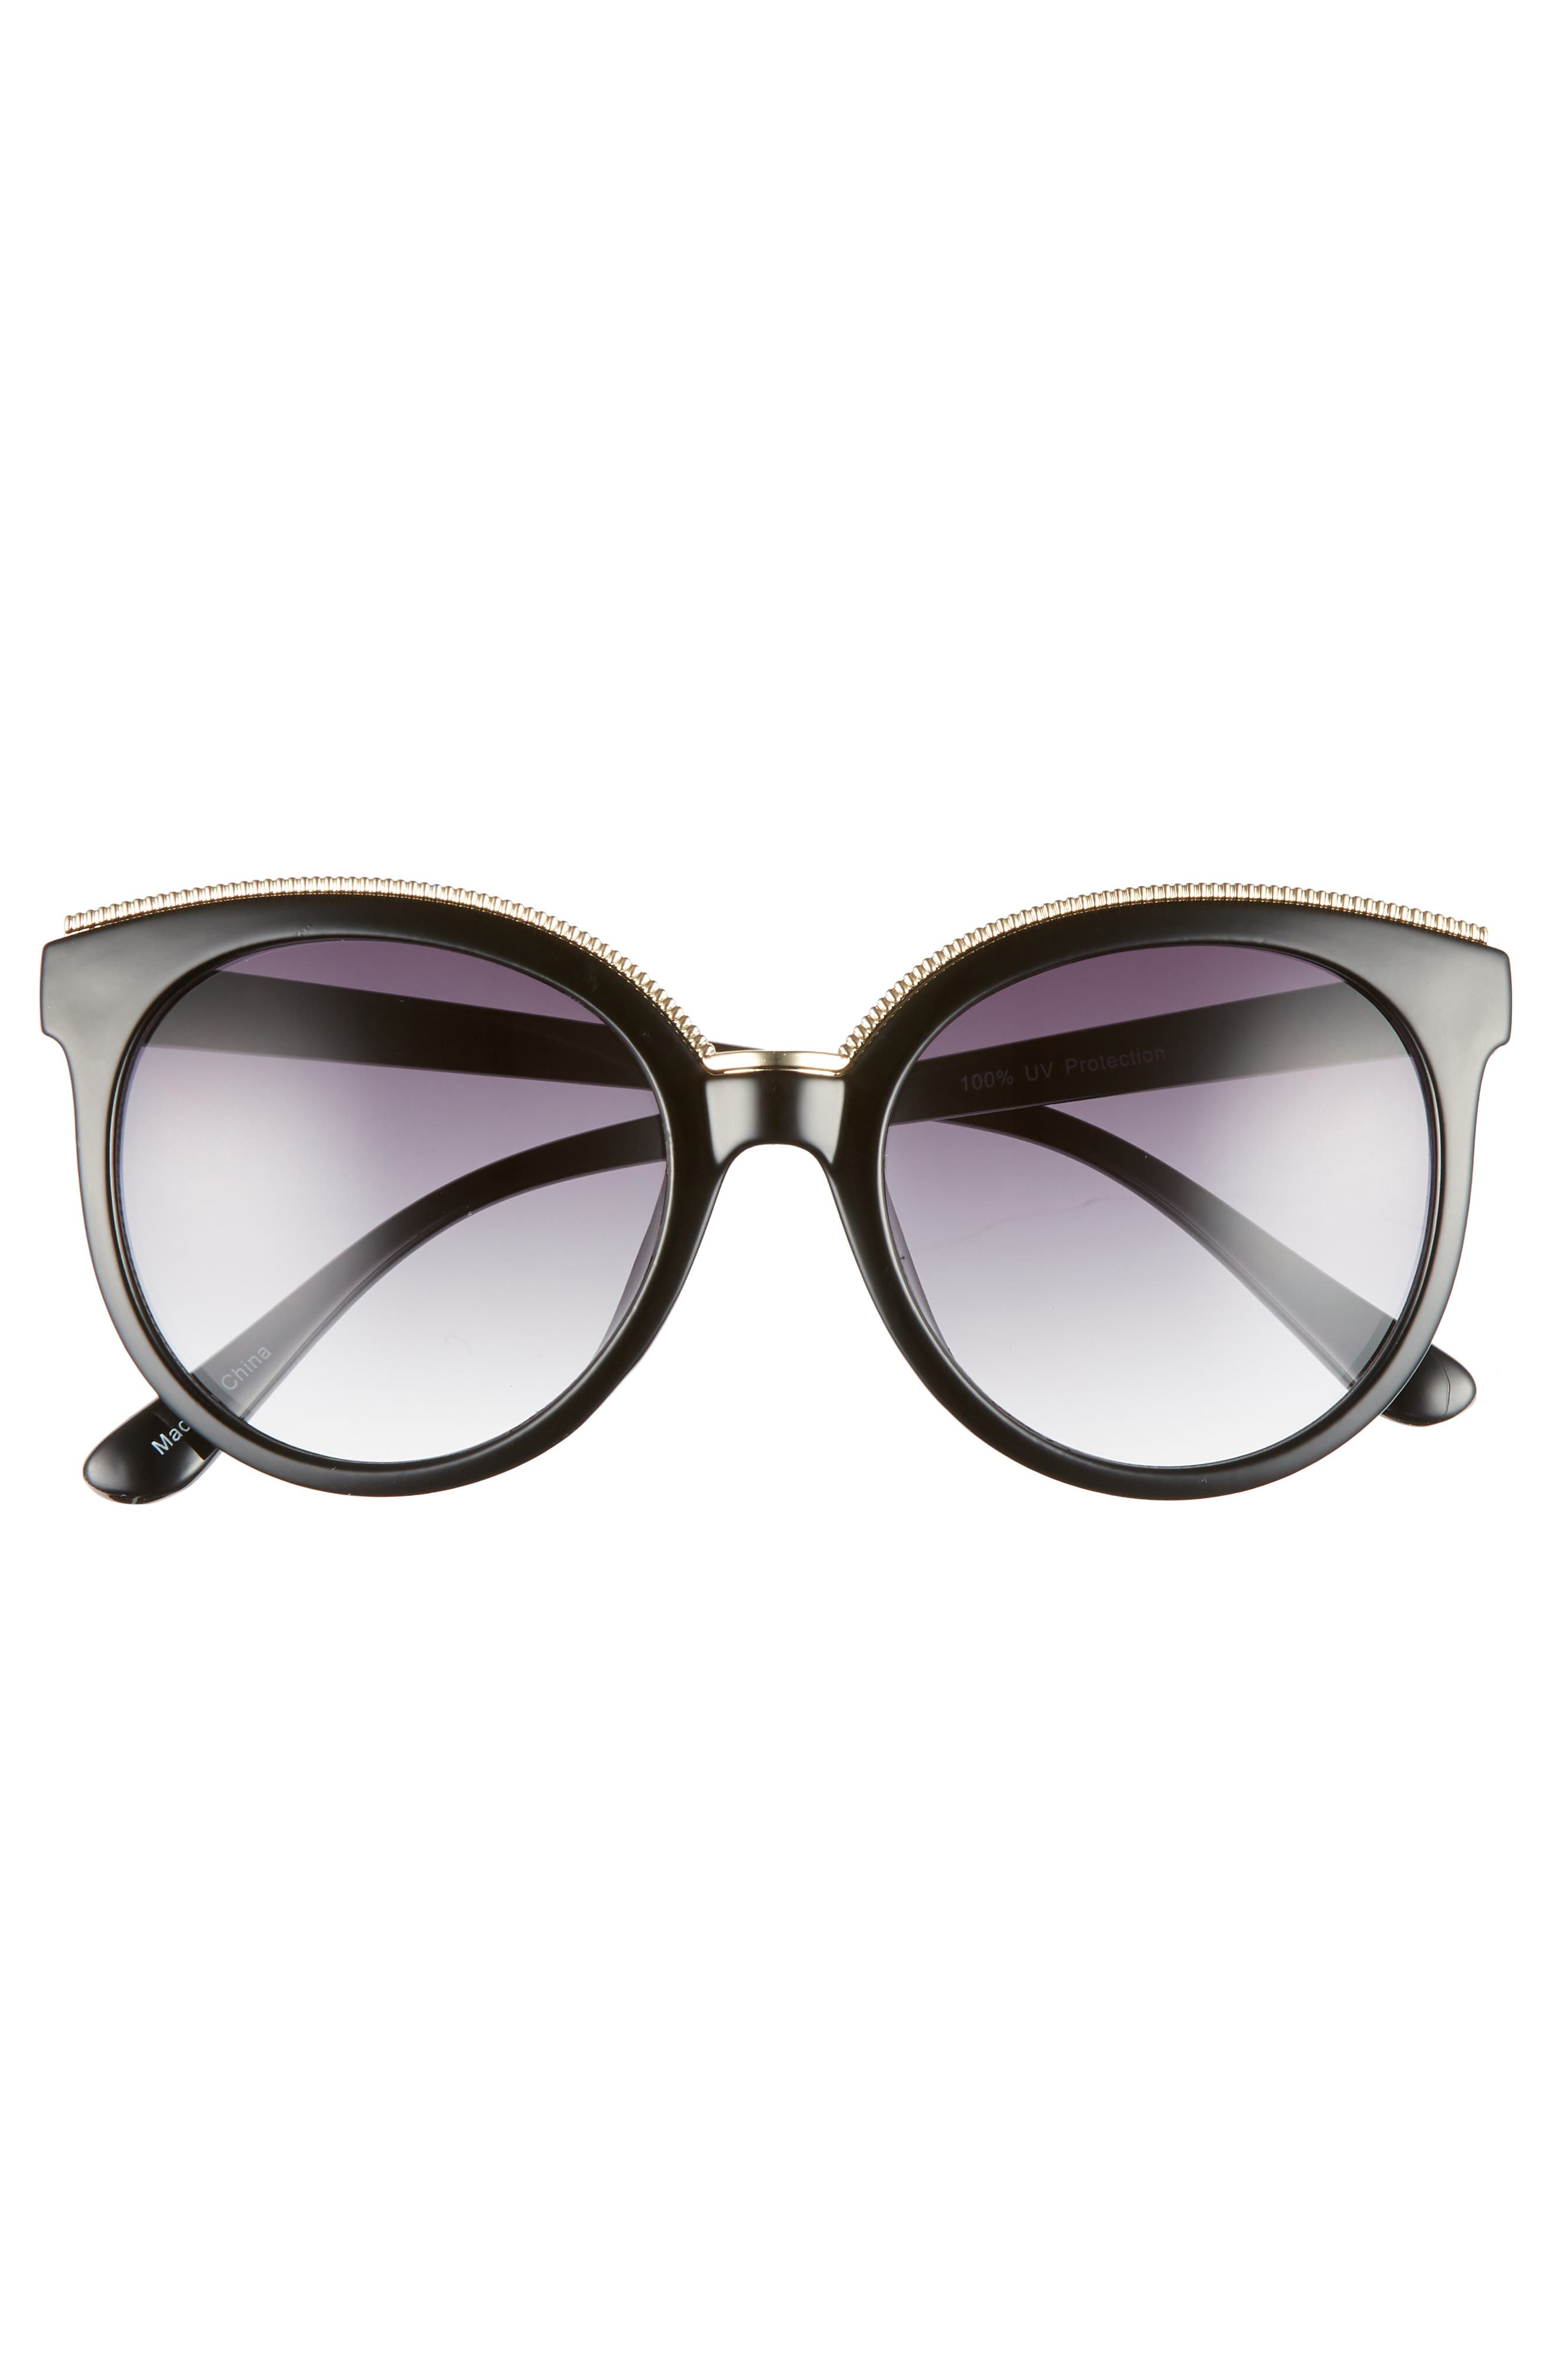 56mm Metal Trim Round Sunglasses,                             Alternate thumbnail 3, color,                             Black/ Gold